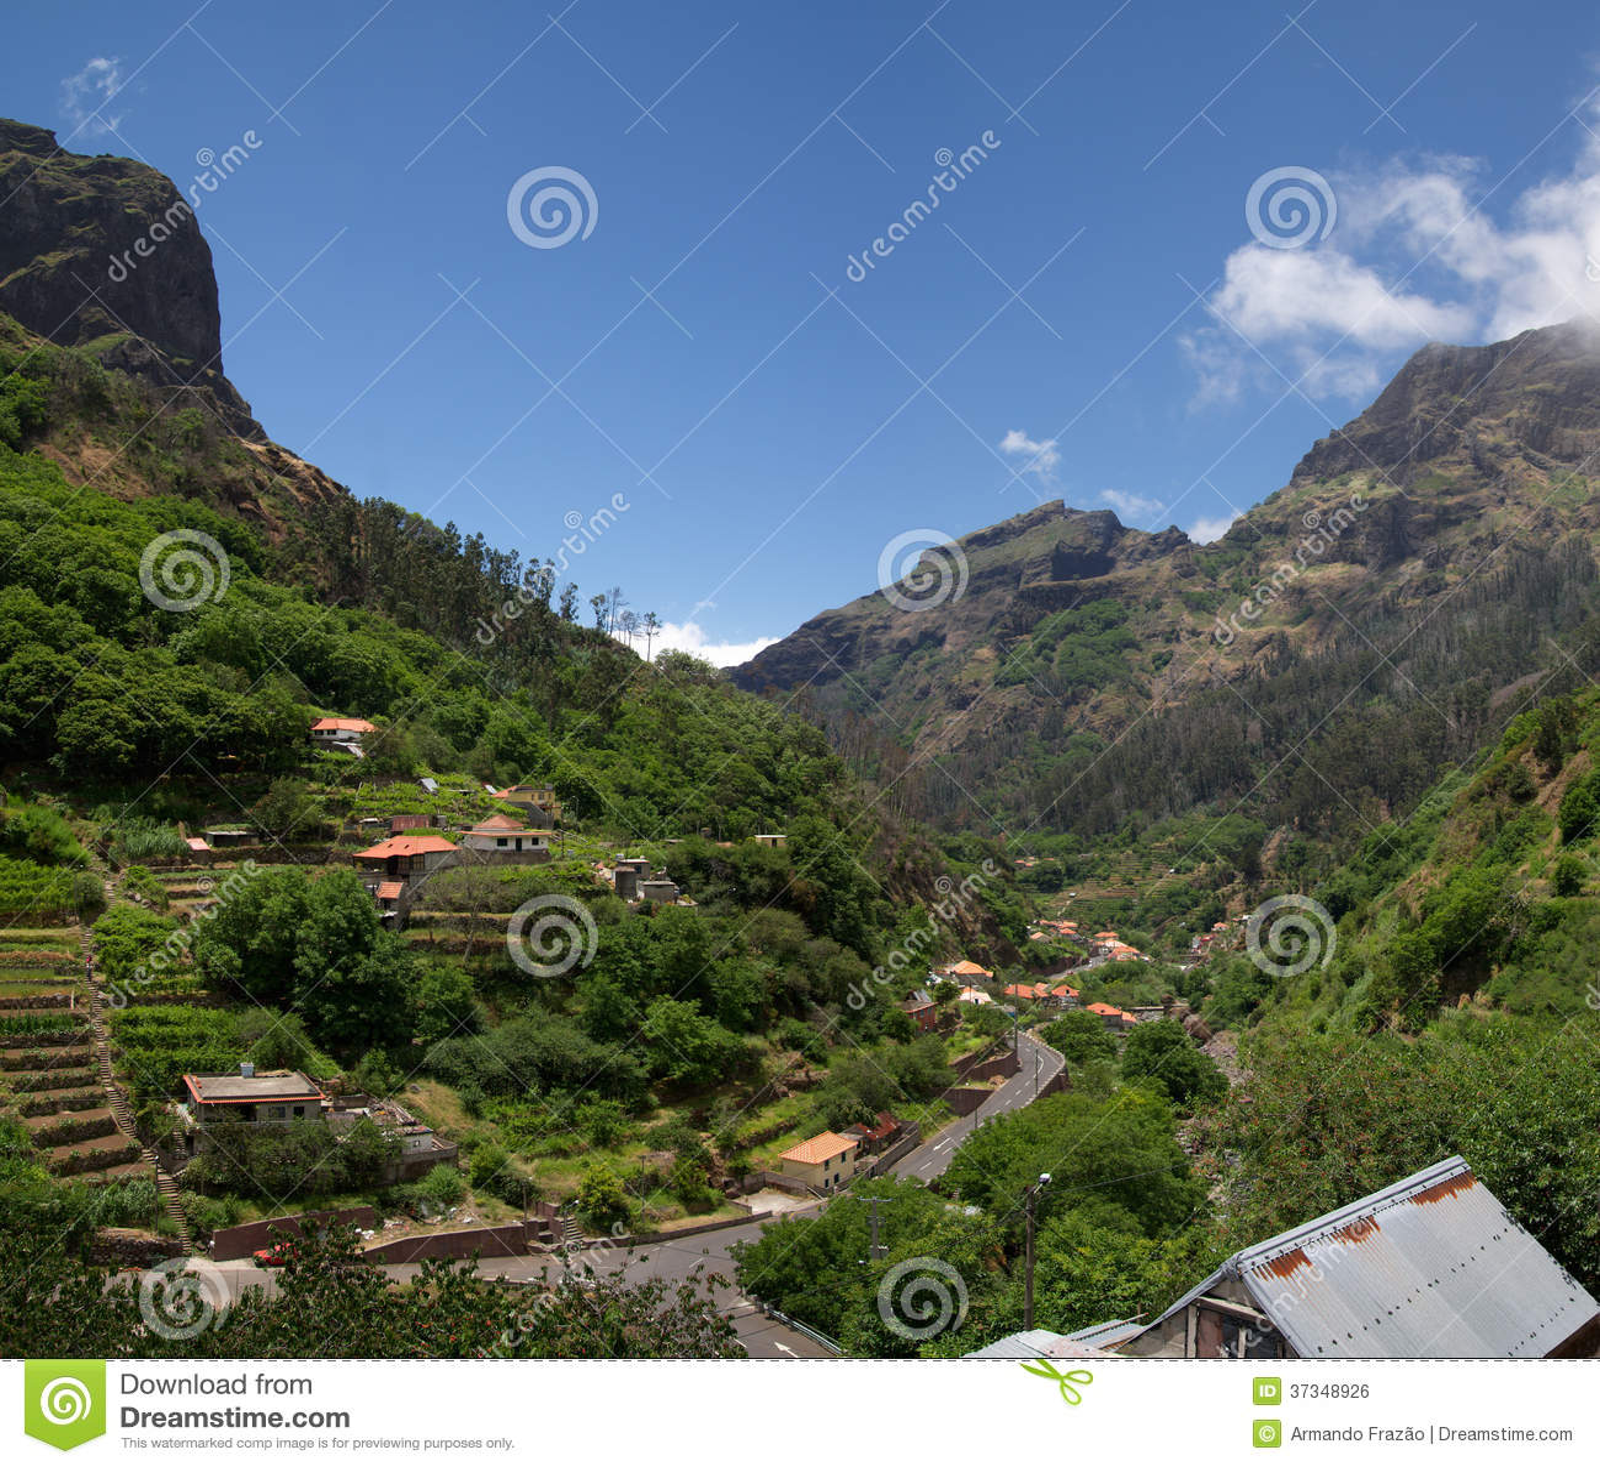 Vale de Curral DAS Freiras, Madeira